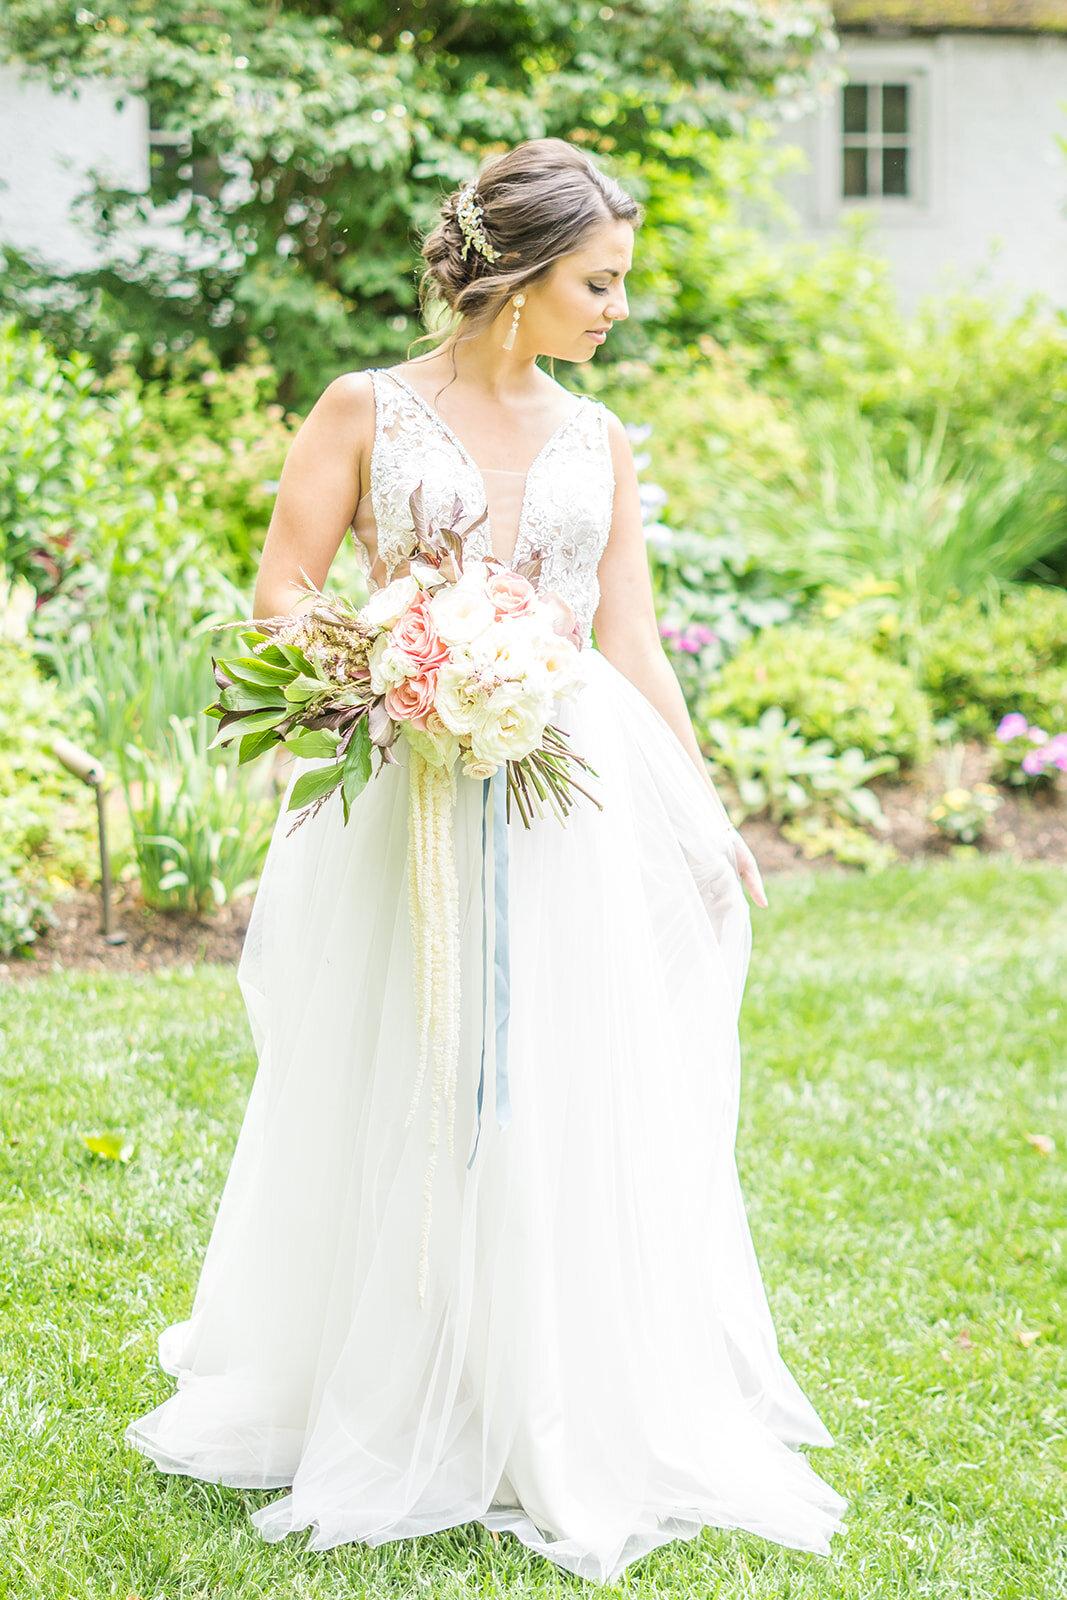 2019 Spring/Summer Wedding Inspo | View Original Post